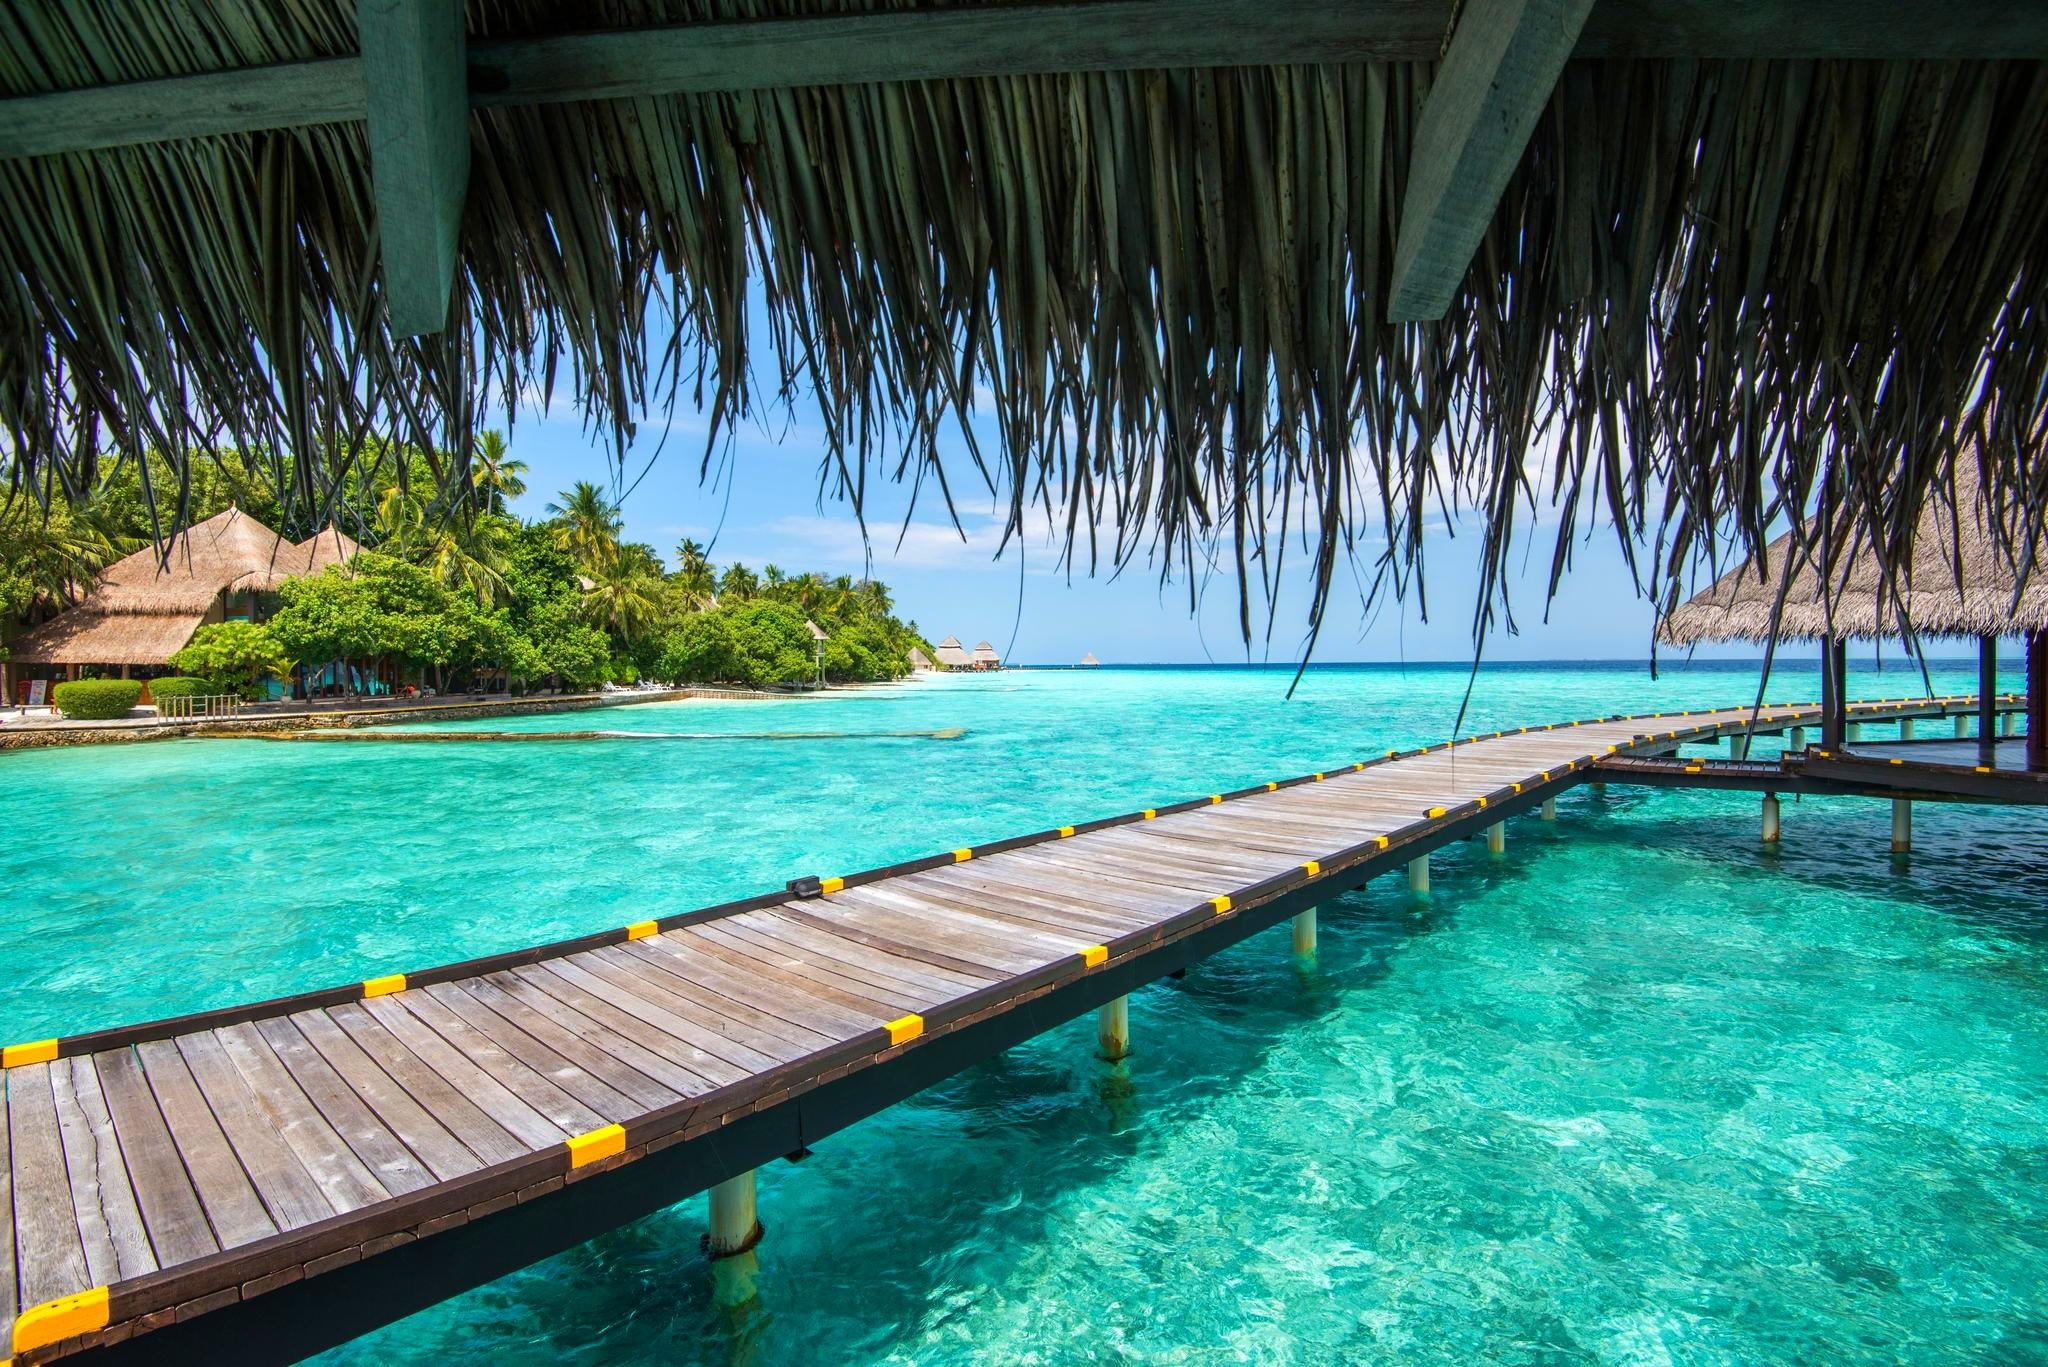 Landschaft Meer Bucht Wasser Natur Strand Palmen Pool Erholungsort Tropisch  Türkis Lagune Sommer  Gehweg Karibik